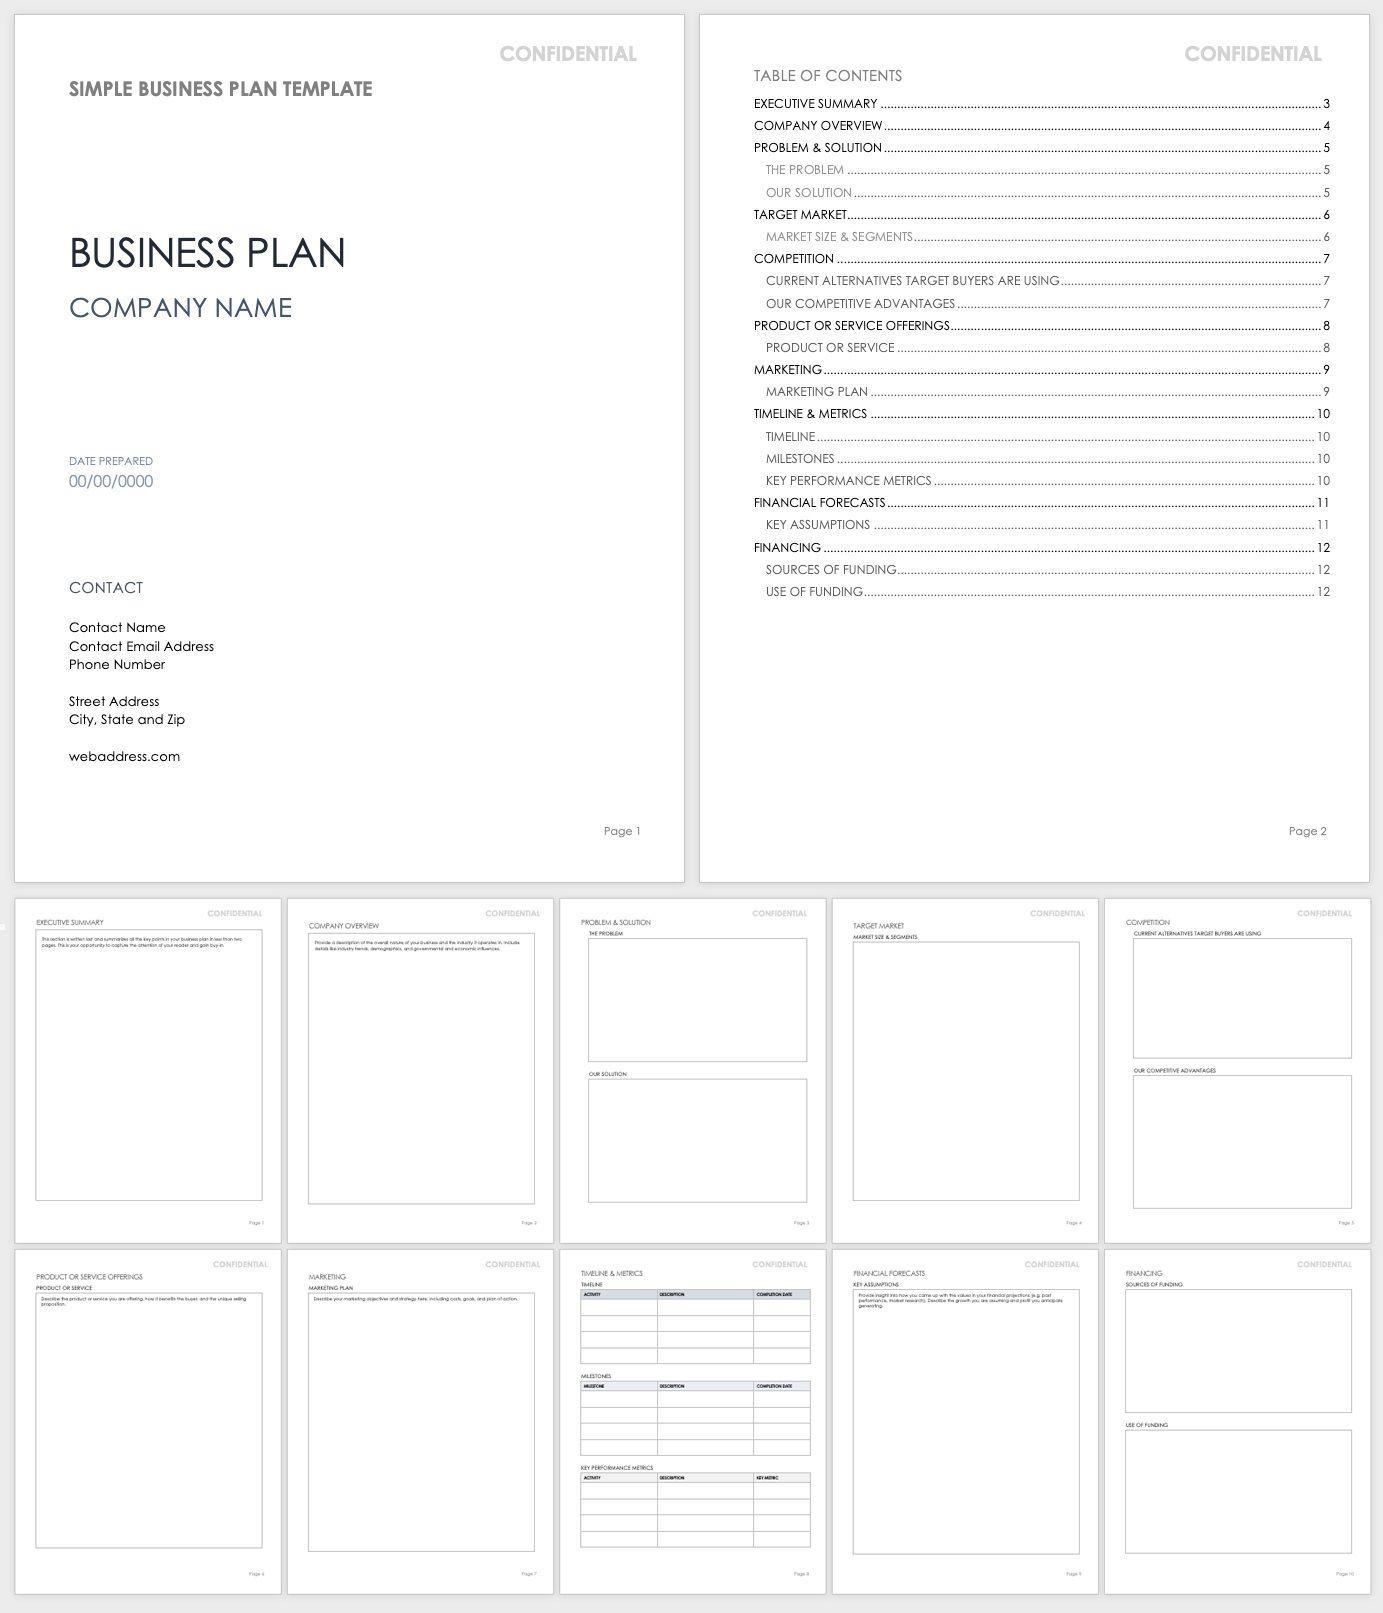 005 Impressive Basic Busines Plan Template Image  Templates Simple Uk Free Restaurant Sample Pdf WordFull